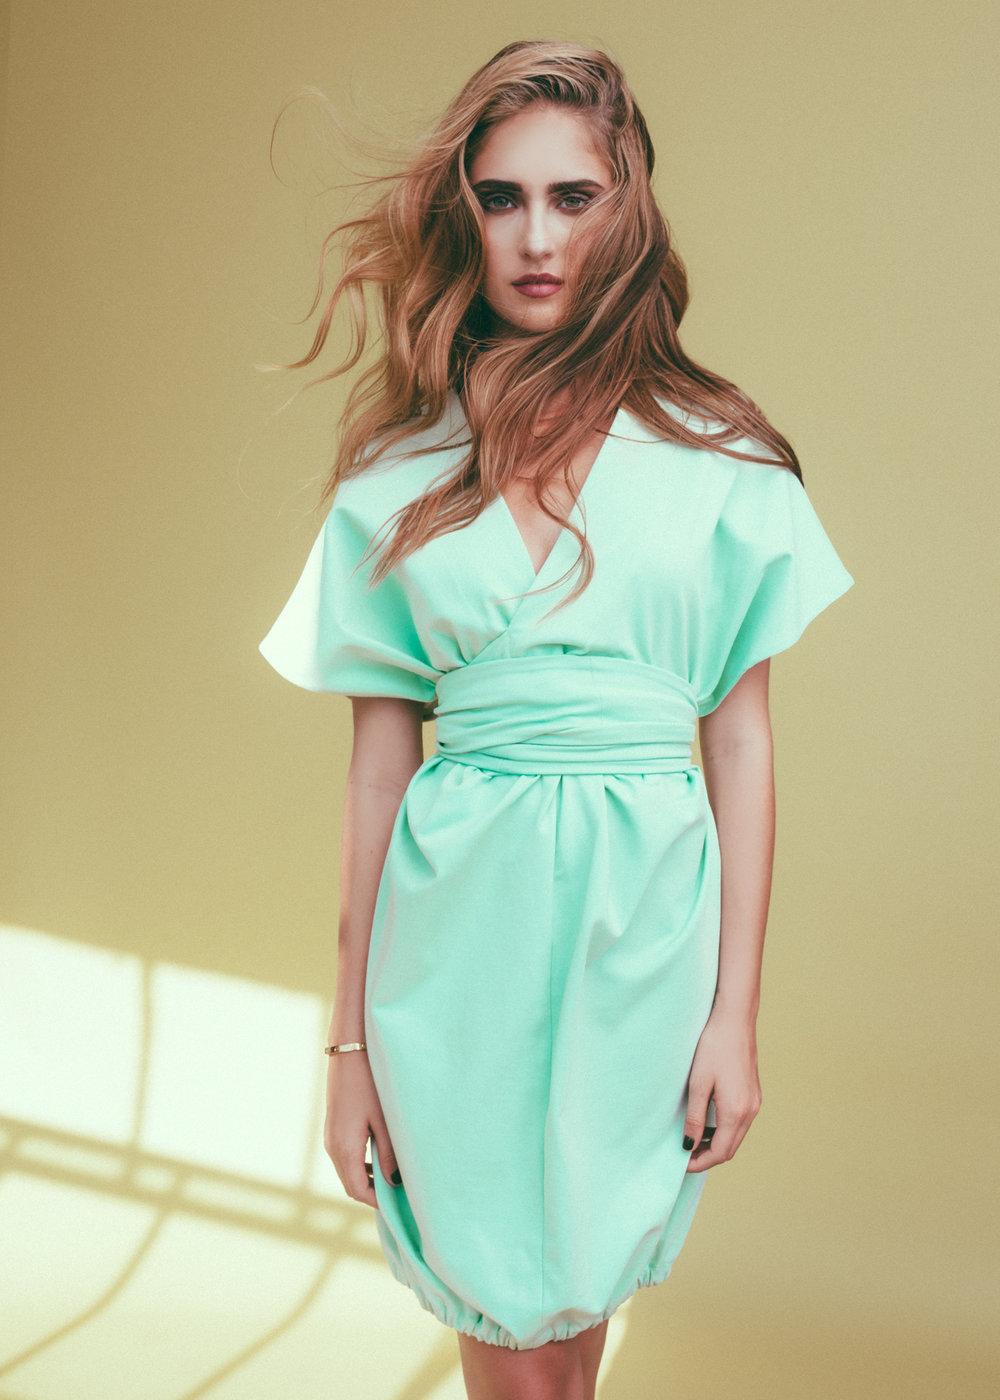 jessica-faulkner-mint-green-dress-womens-contemporary-clothing.jpg